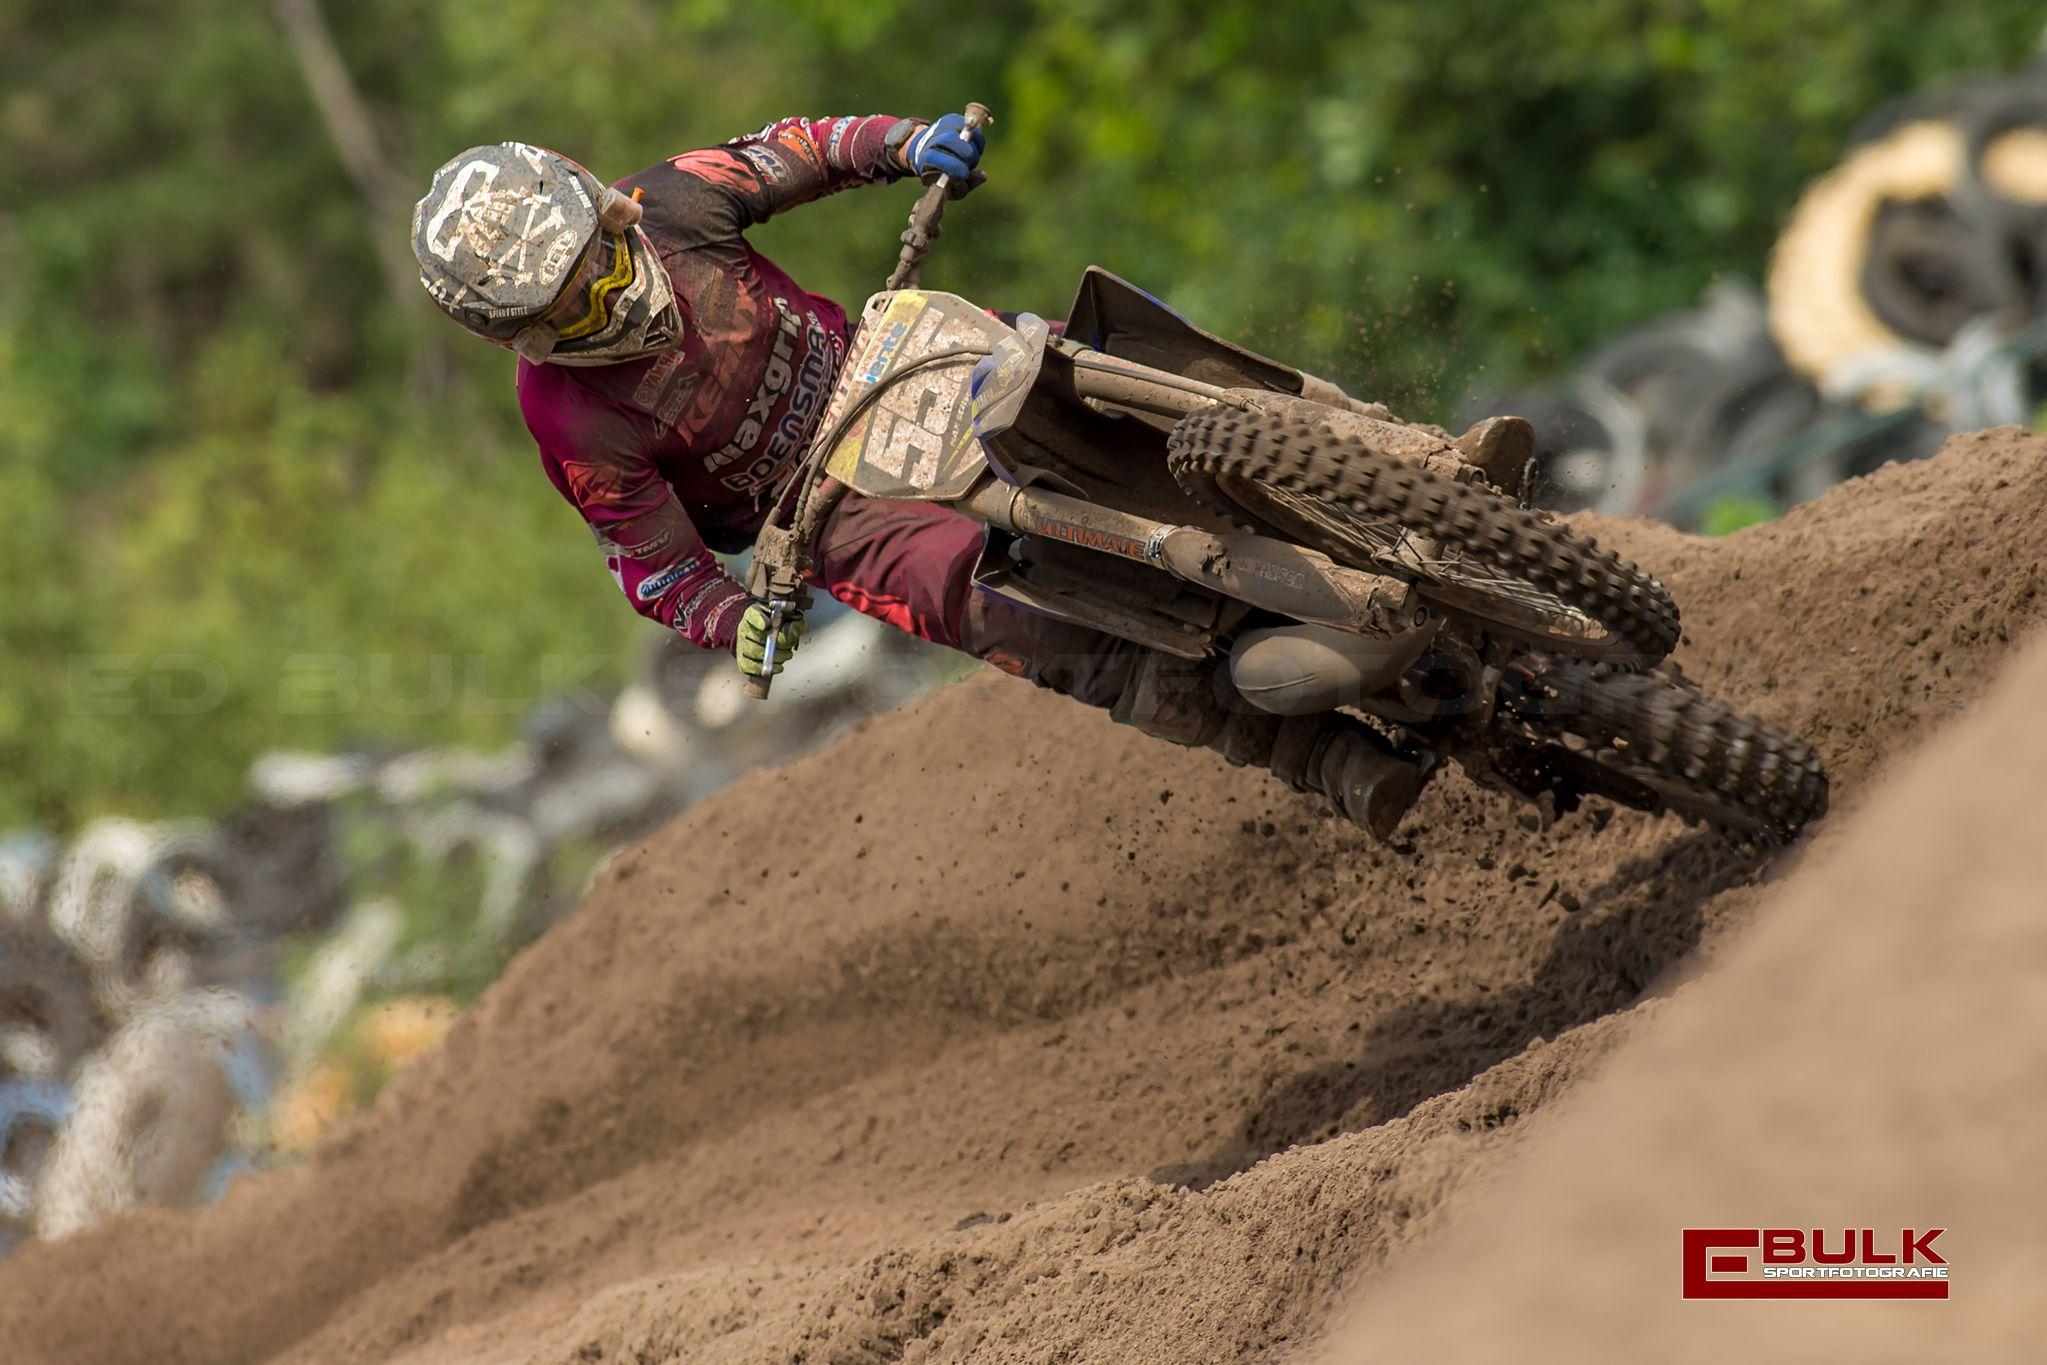 eebs2125-ed_bulk_sportfotografie